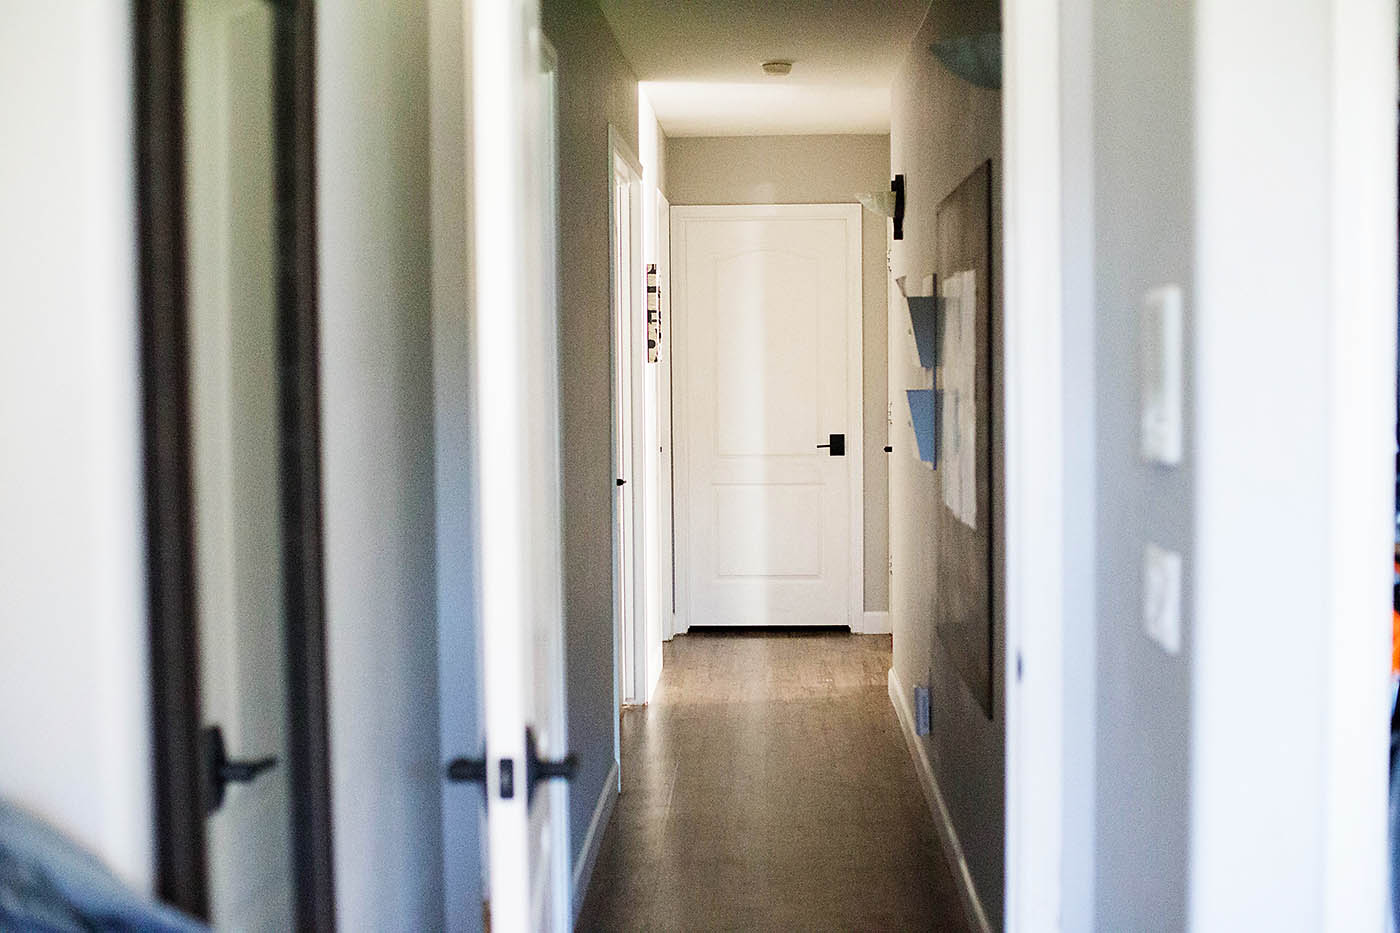 New Schlage interior doorknobs